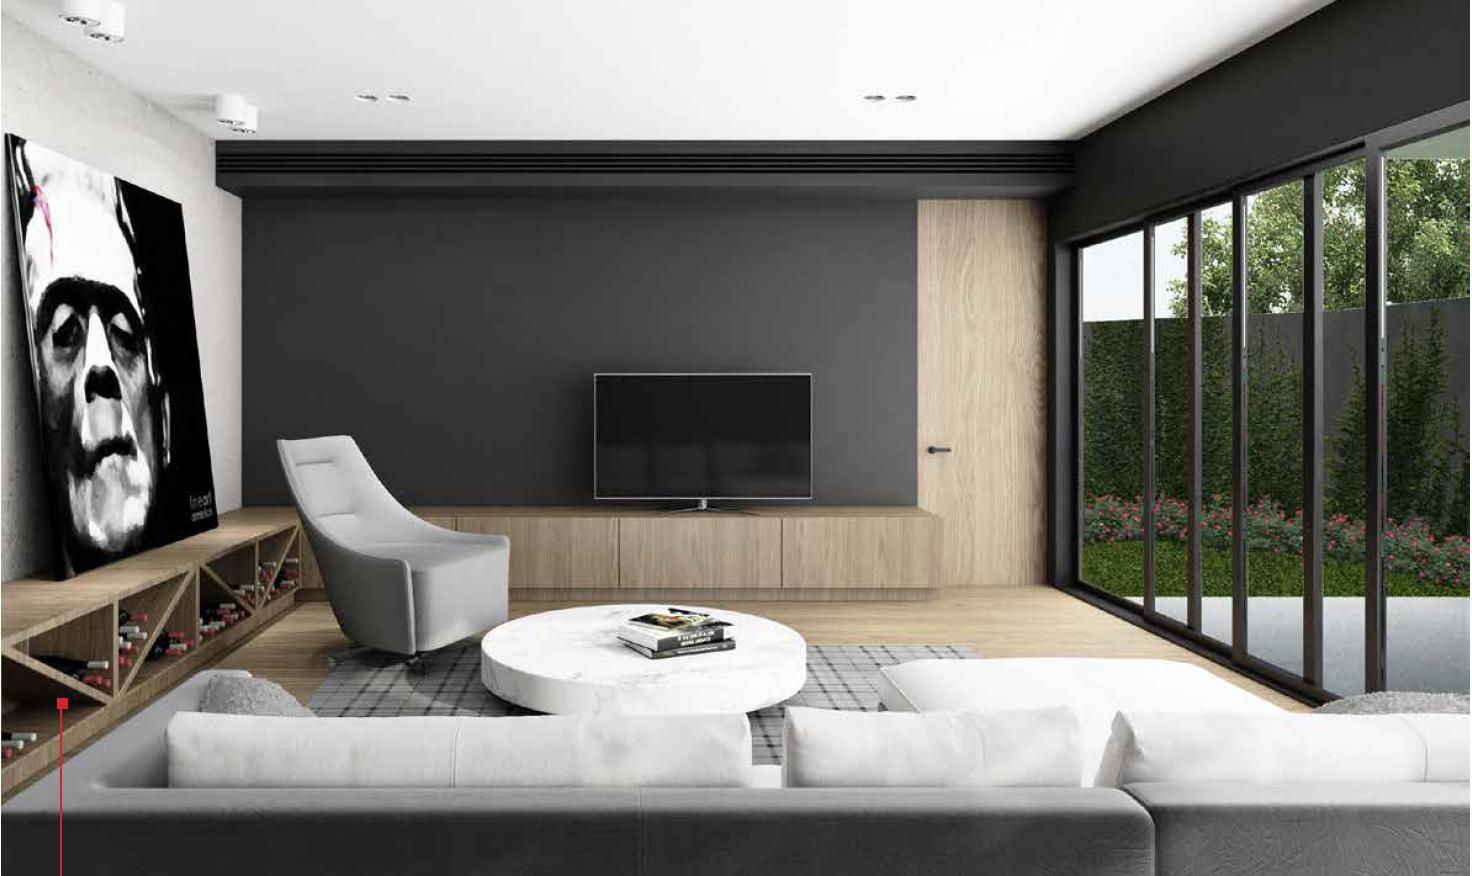 Beaumaris Residence - Interior Design & Landscape Design (Under Construction)